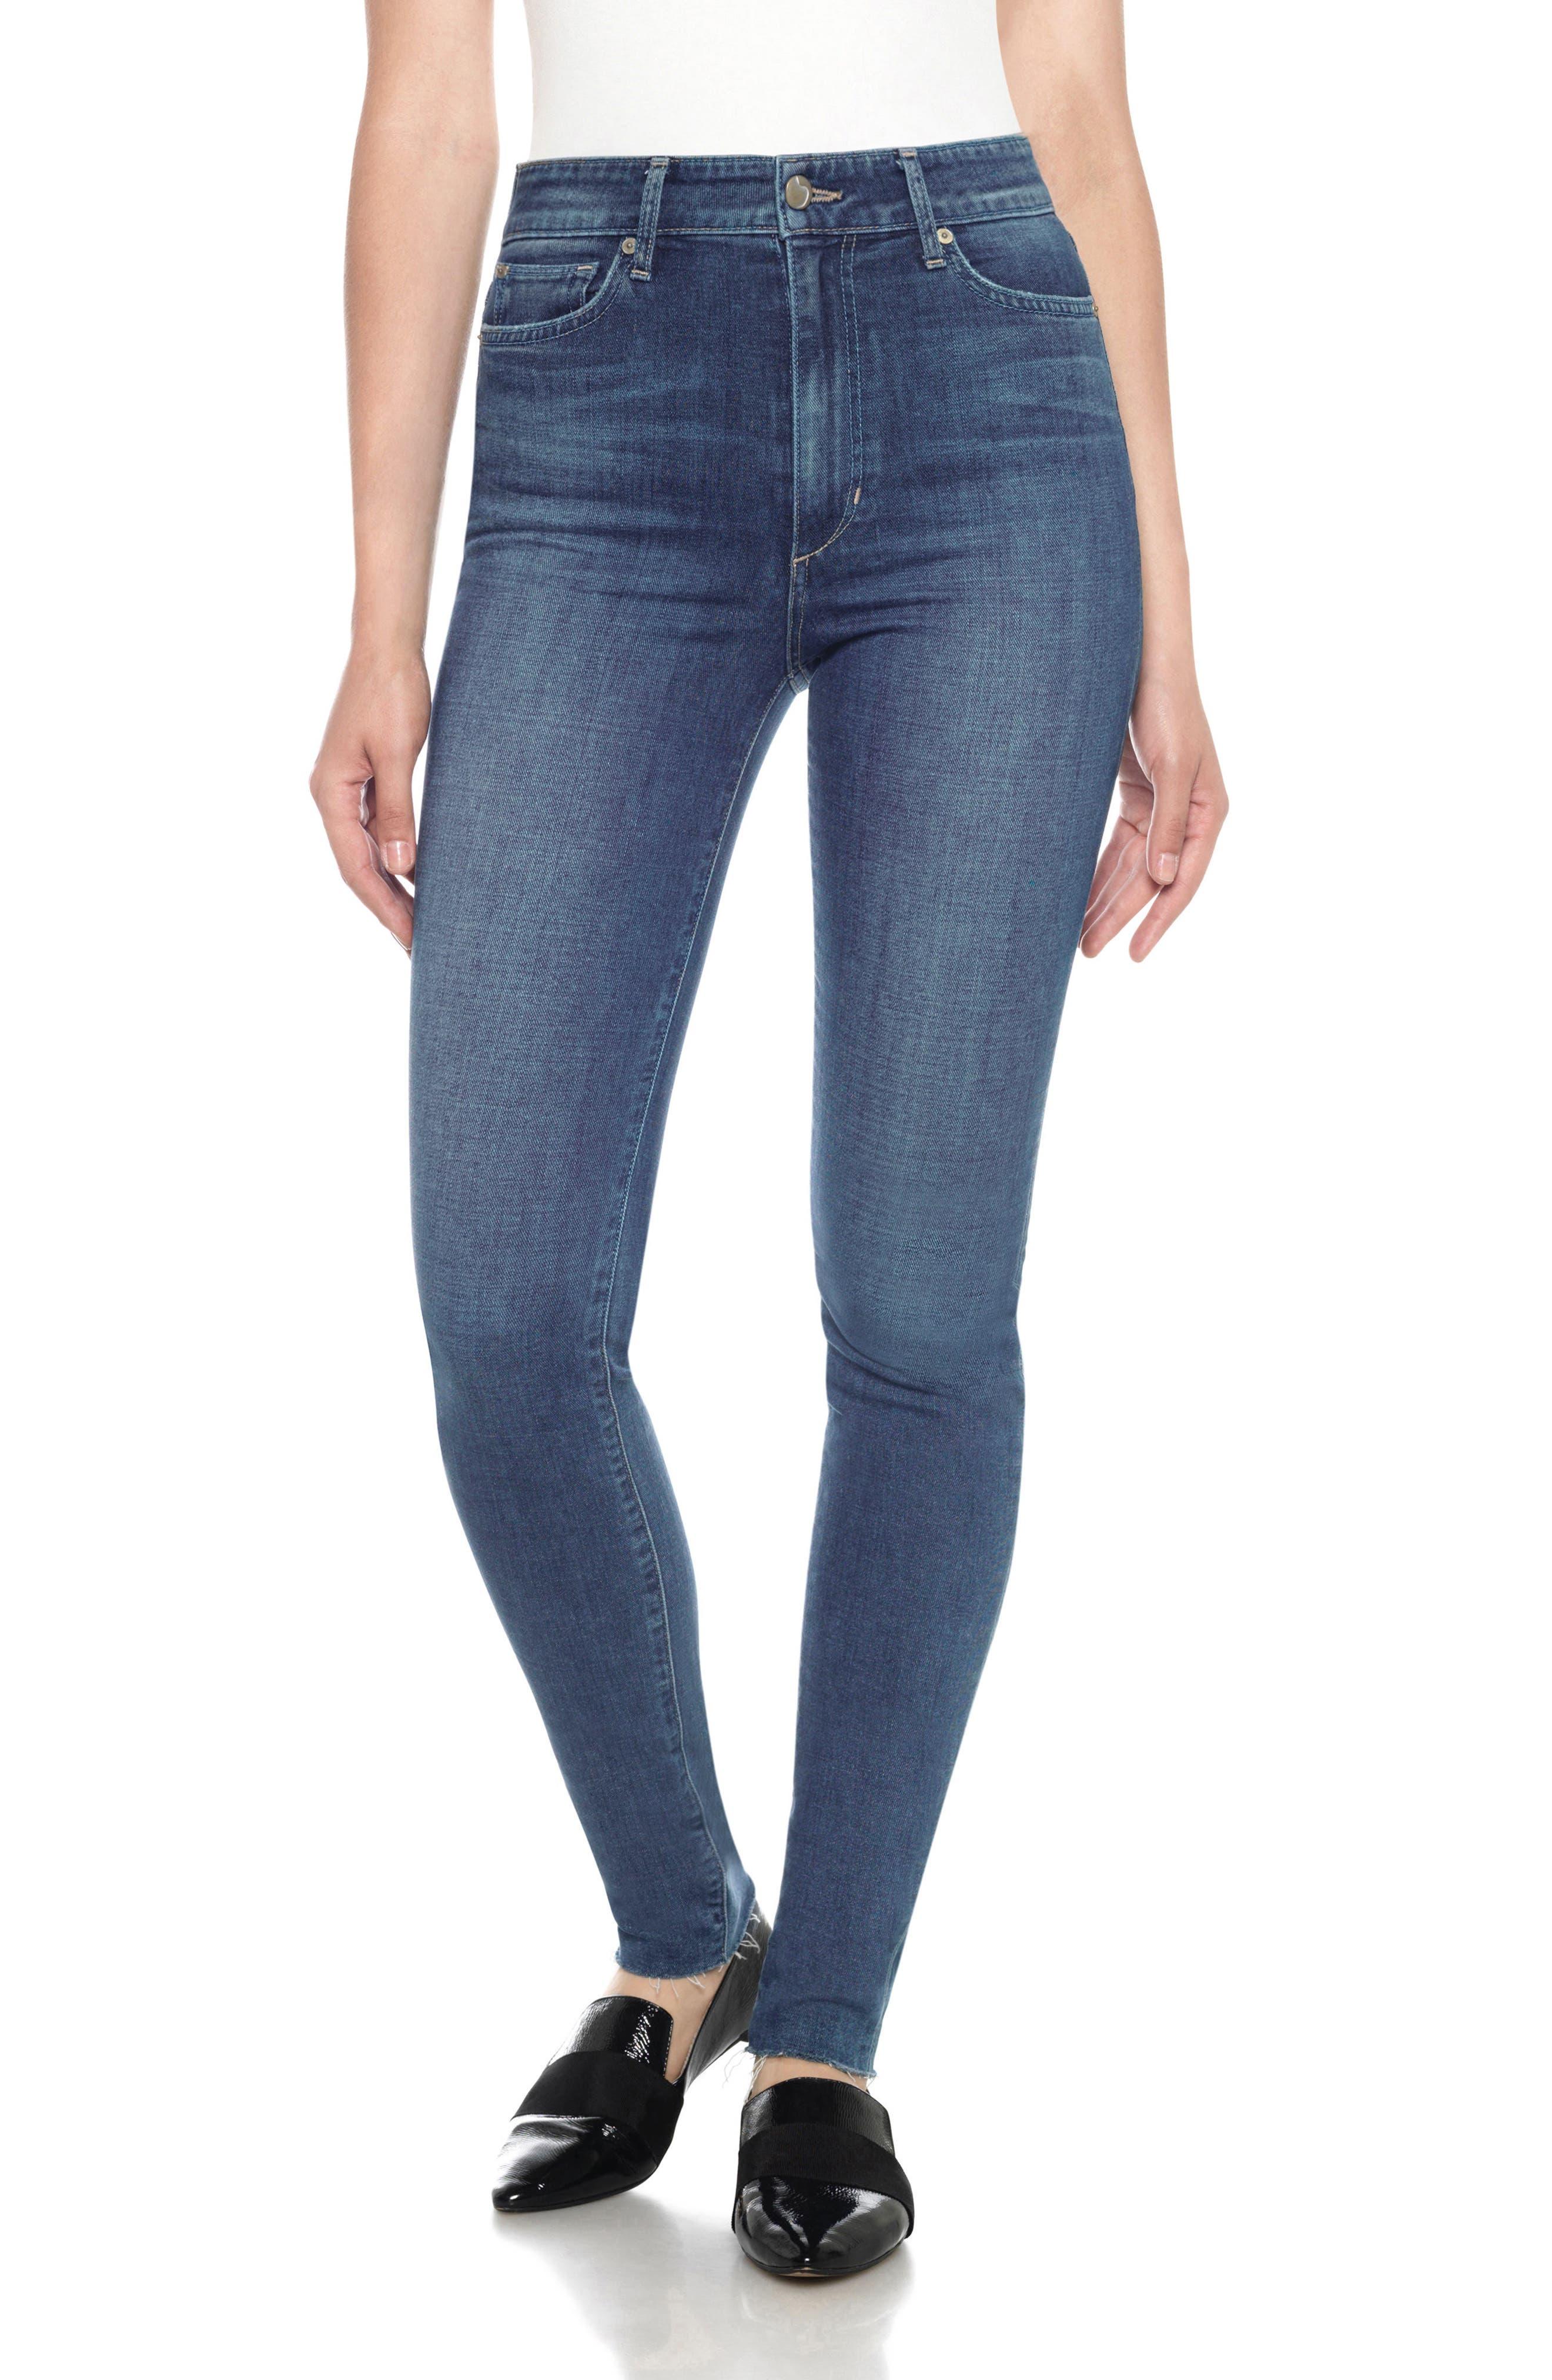 JOES Bella High Waist Skinny Jeans